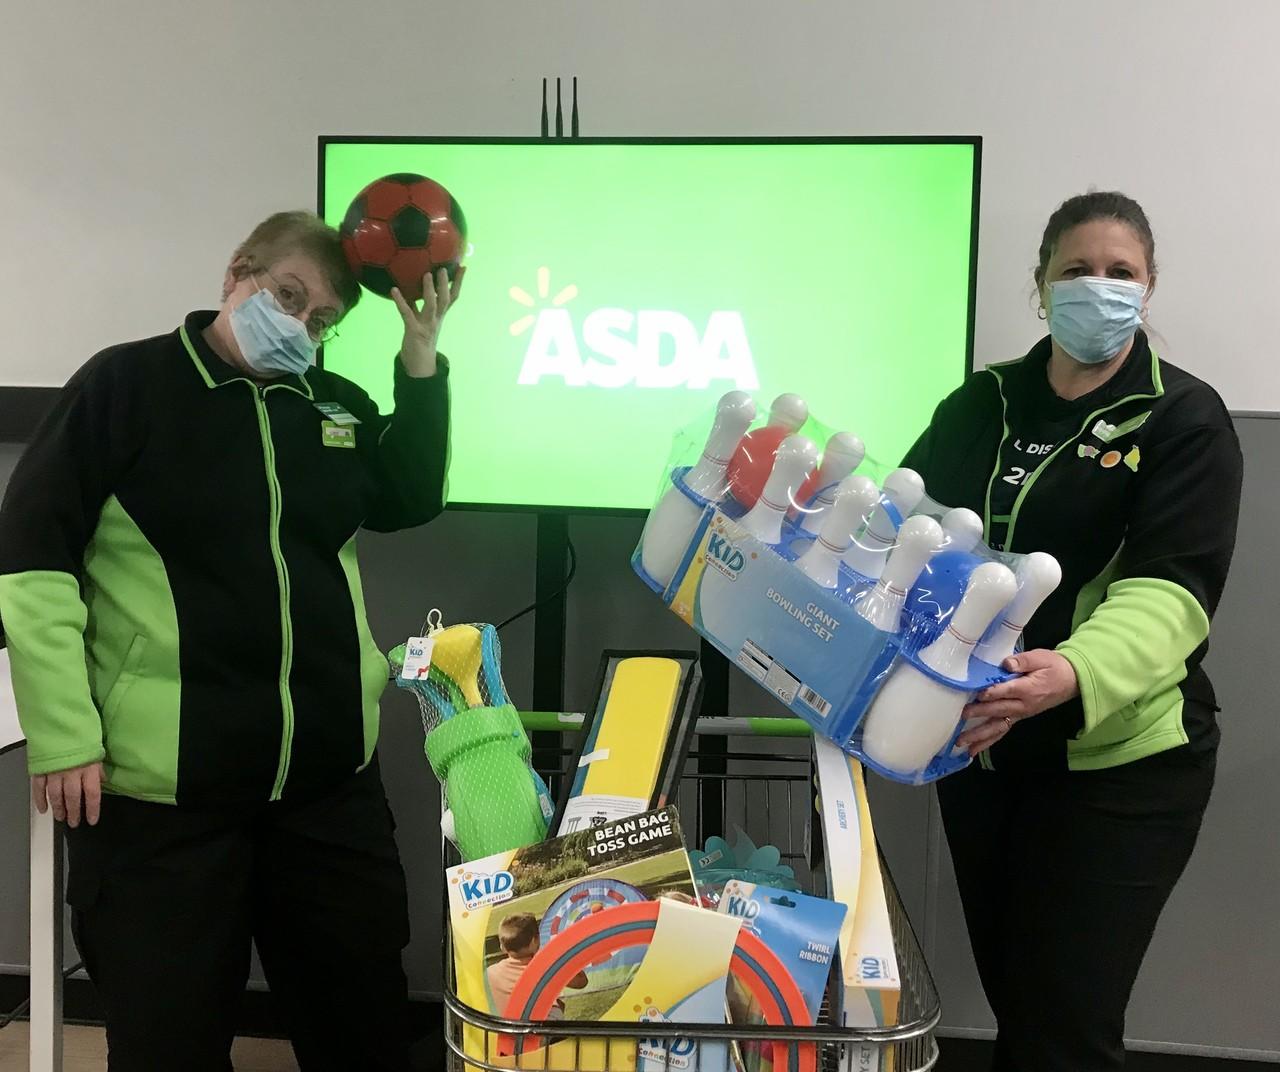 We Hear You donation | Asda Frome